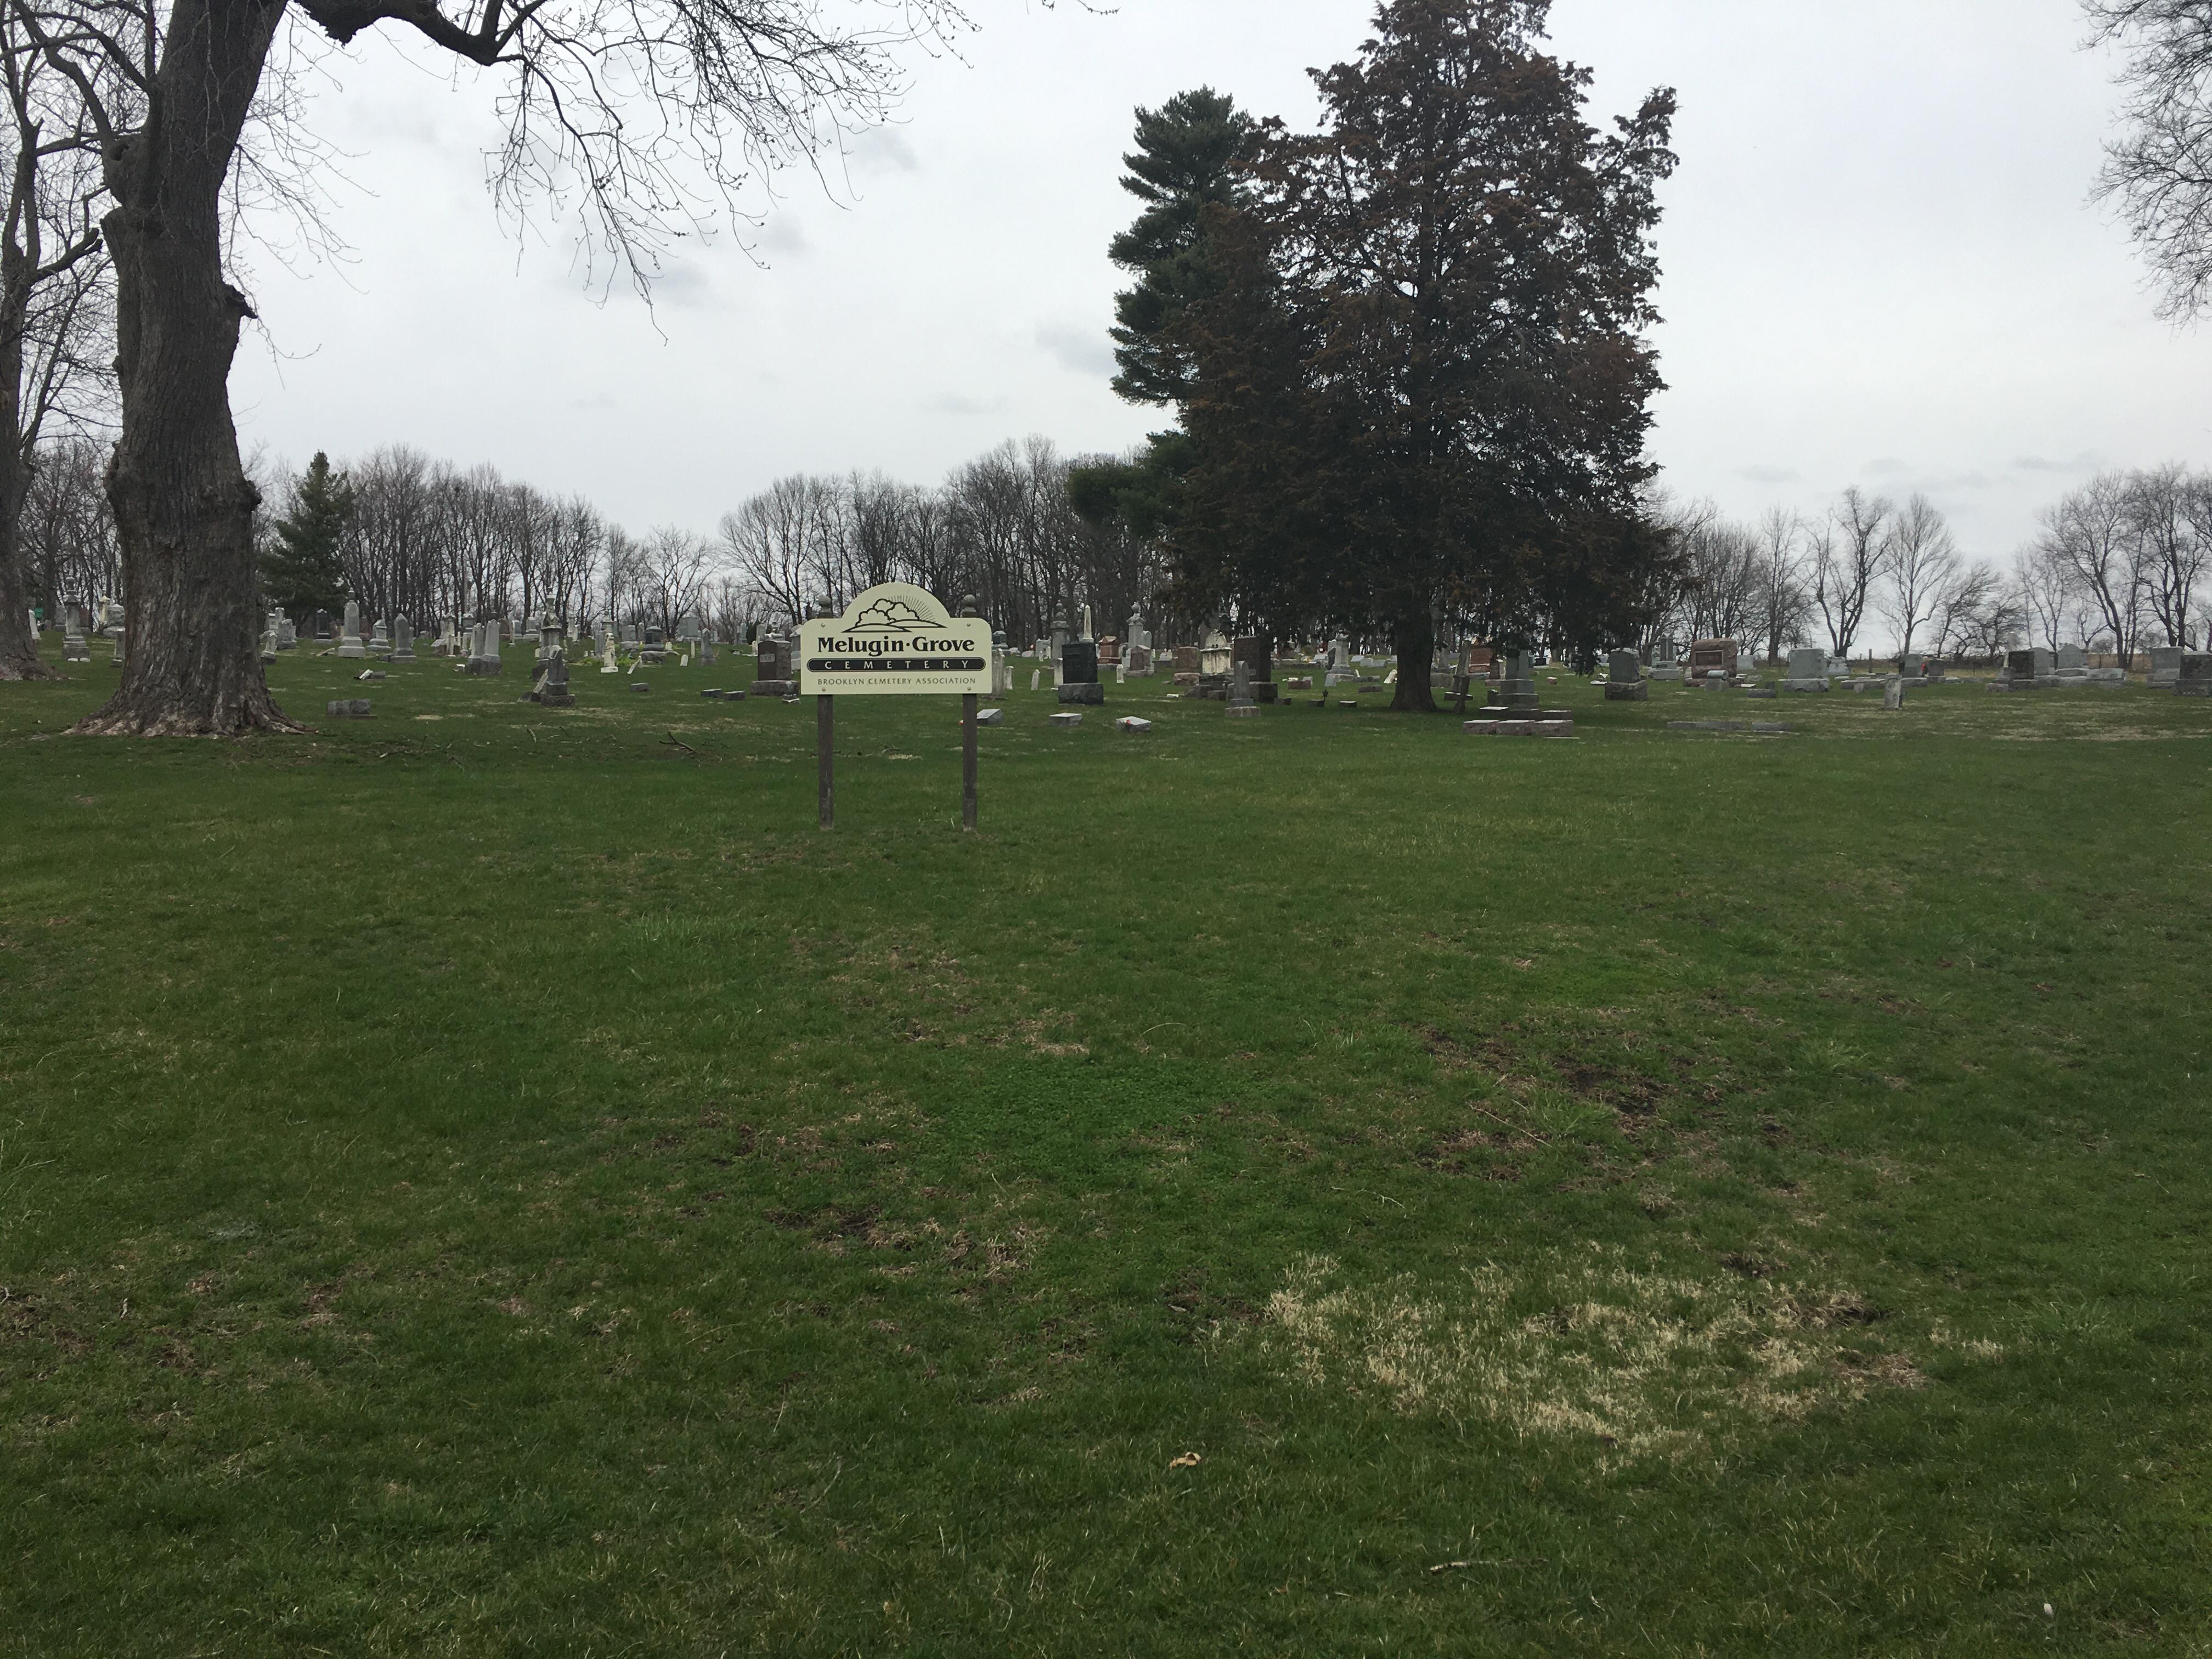 Melugin Grove cemetery Sign